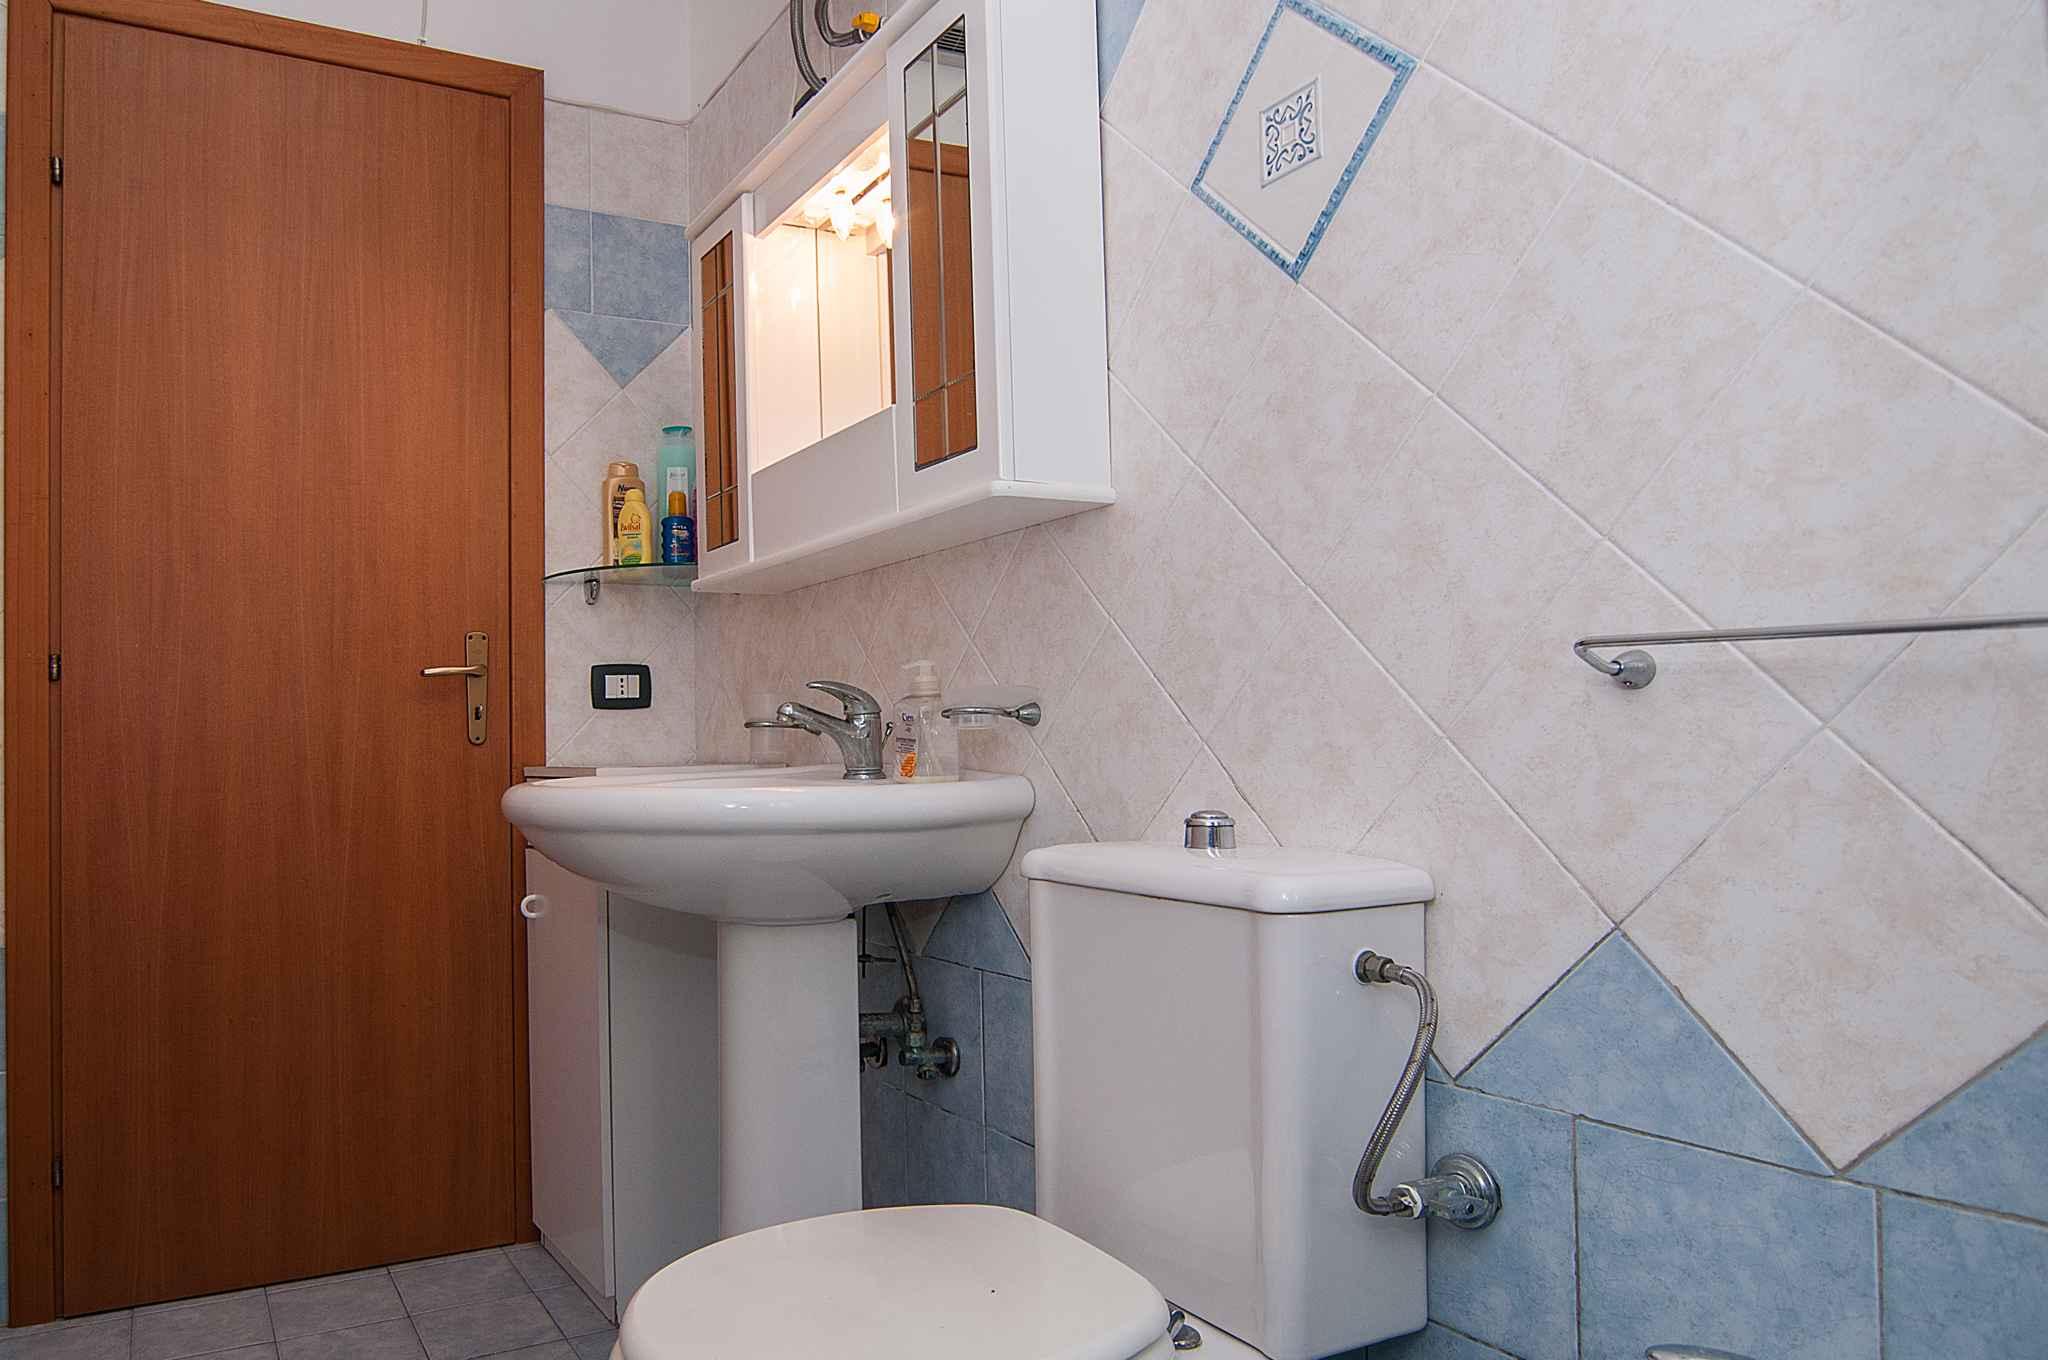 Maison de vacances mit Blick auf Zitronengarten (317534), Lido di Noto, Siracusa, Sicile, Italie, image 20